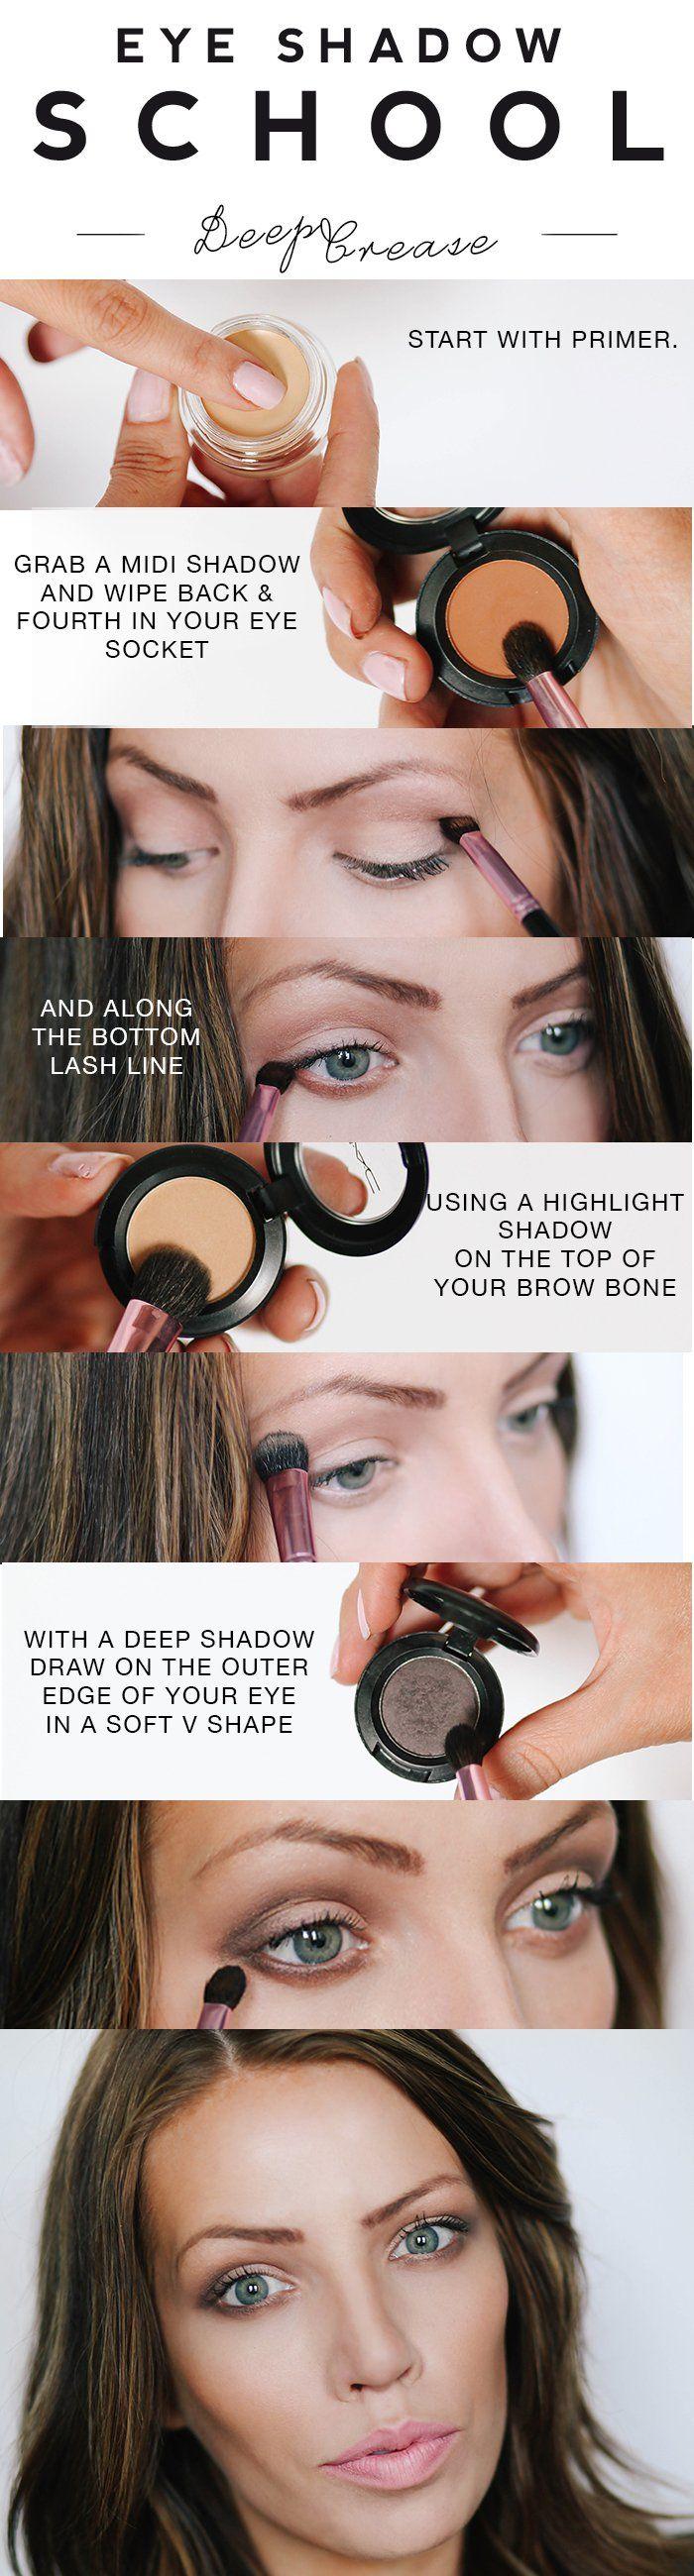 Simplifying eye shadow techniques!